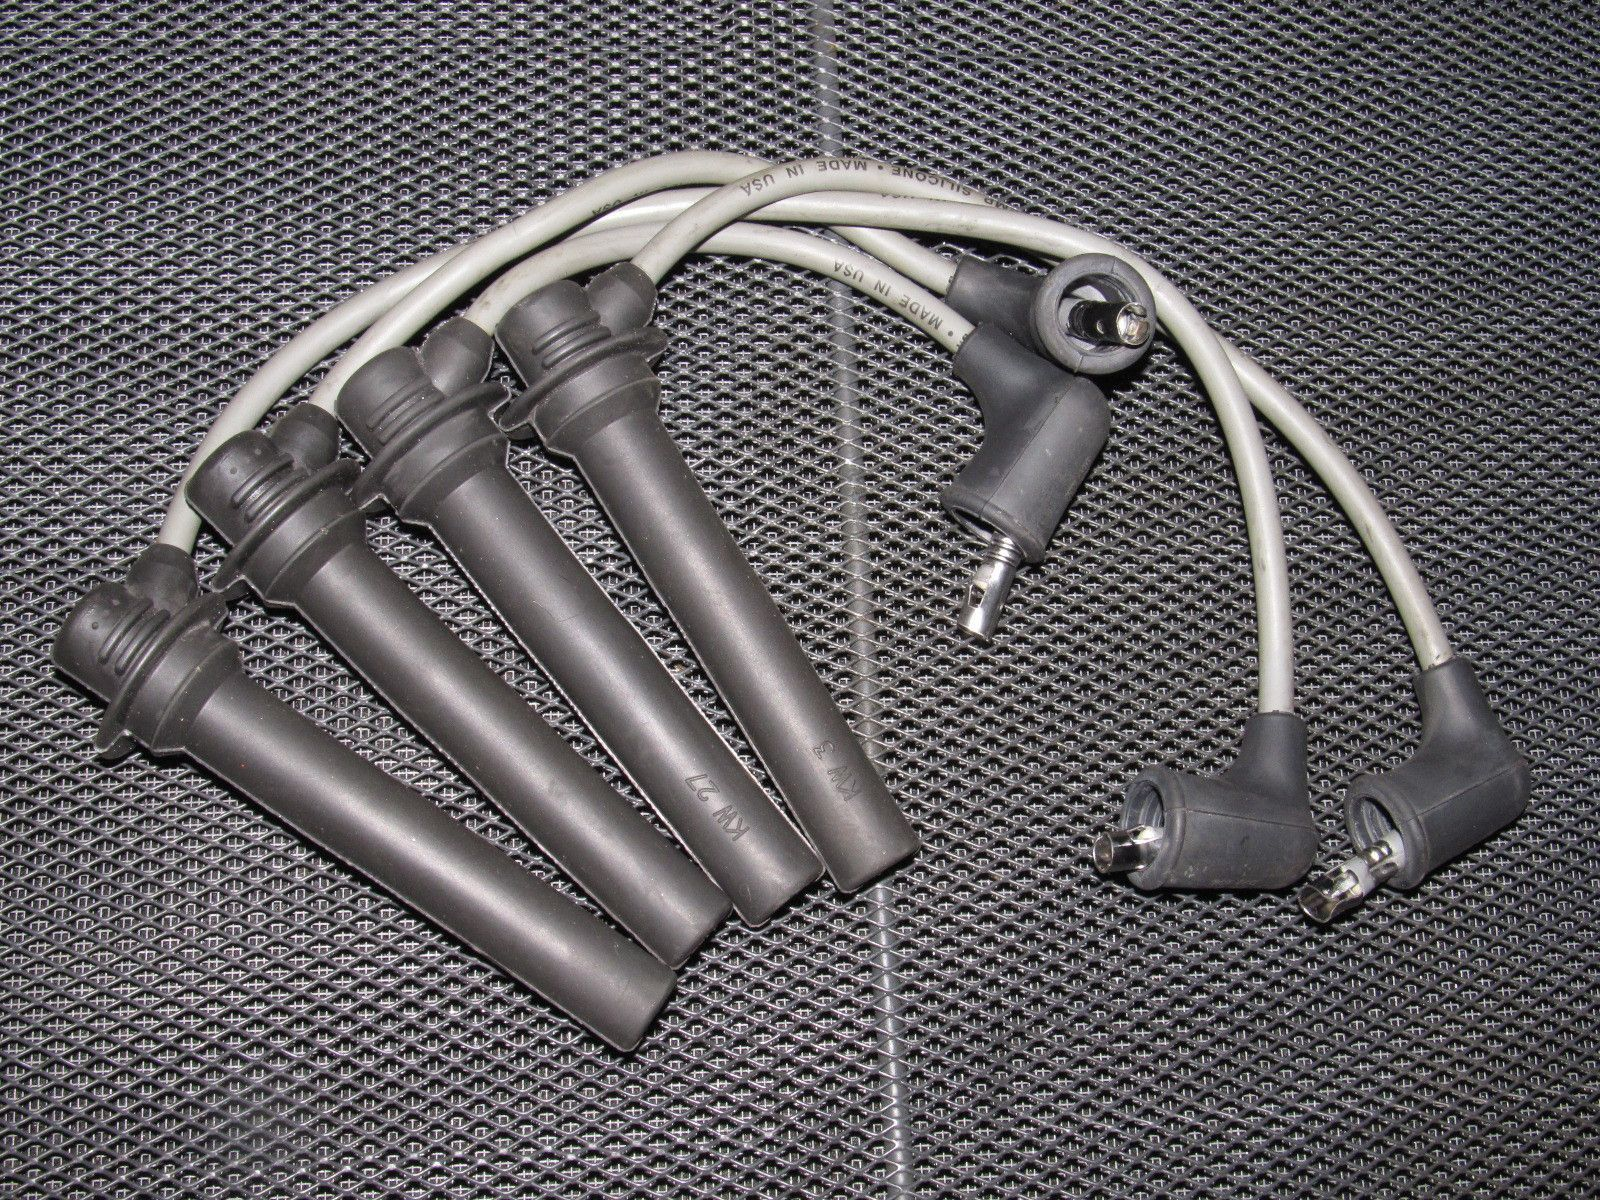 94 95 96 97 Mazda Miata OEM Ignition Wires